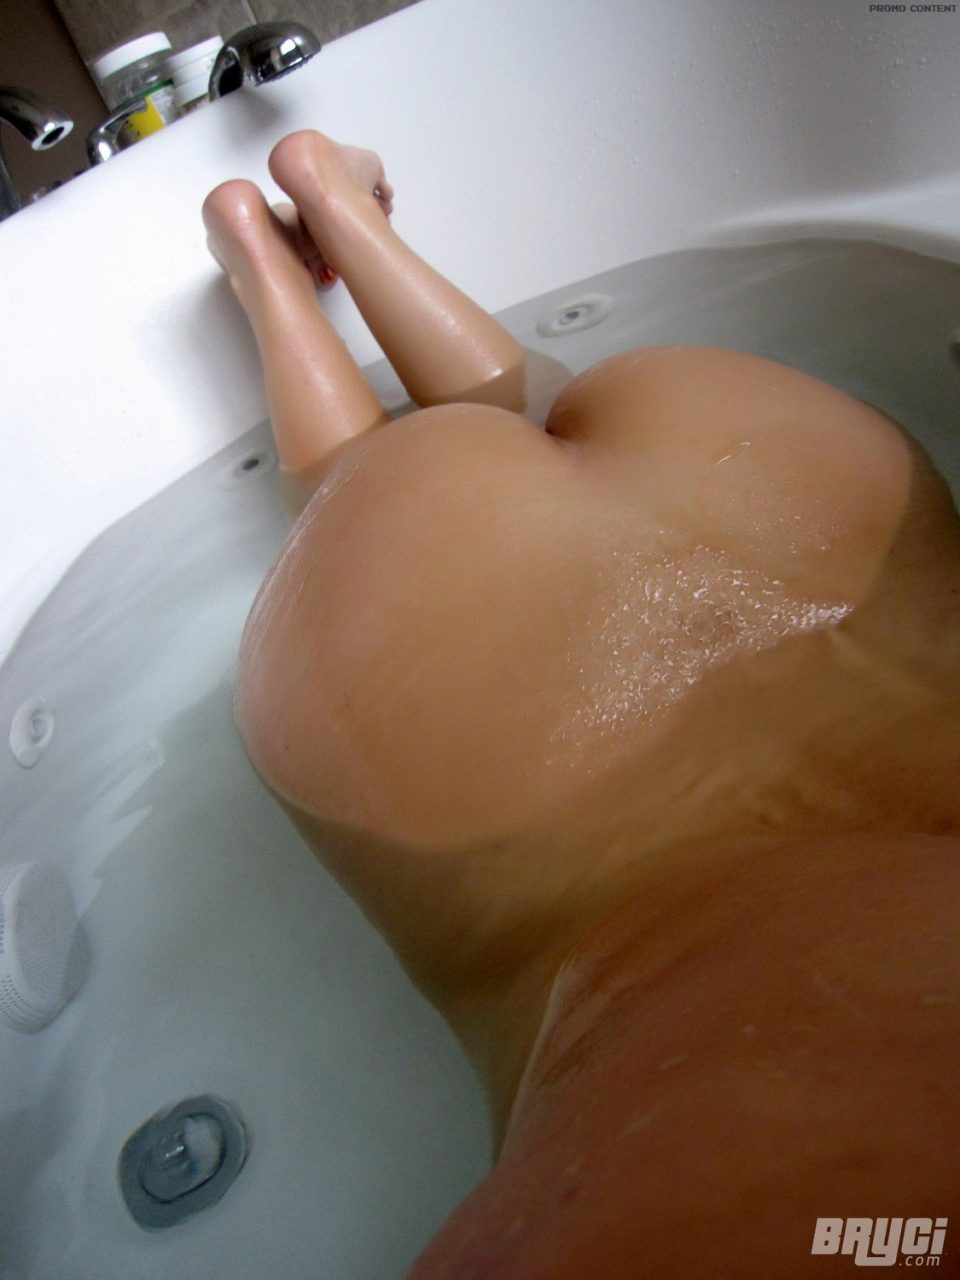 Nude Bath Photo photo 2